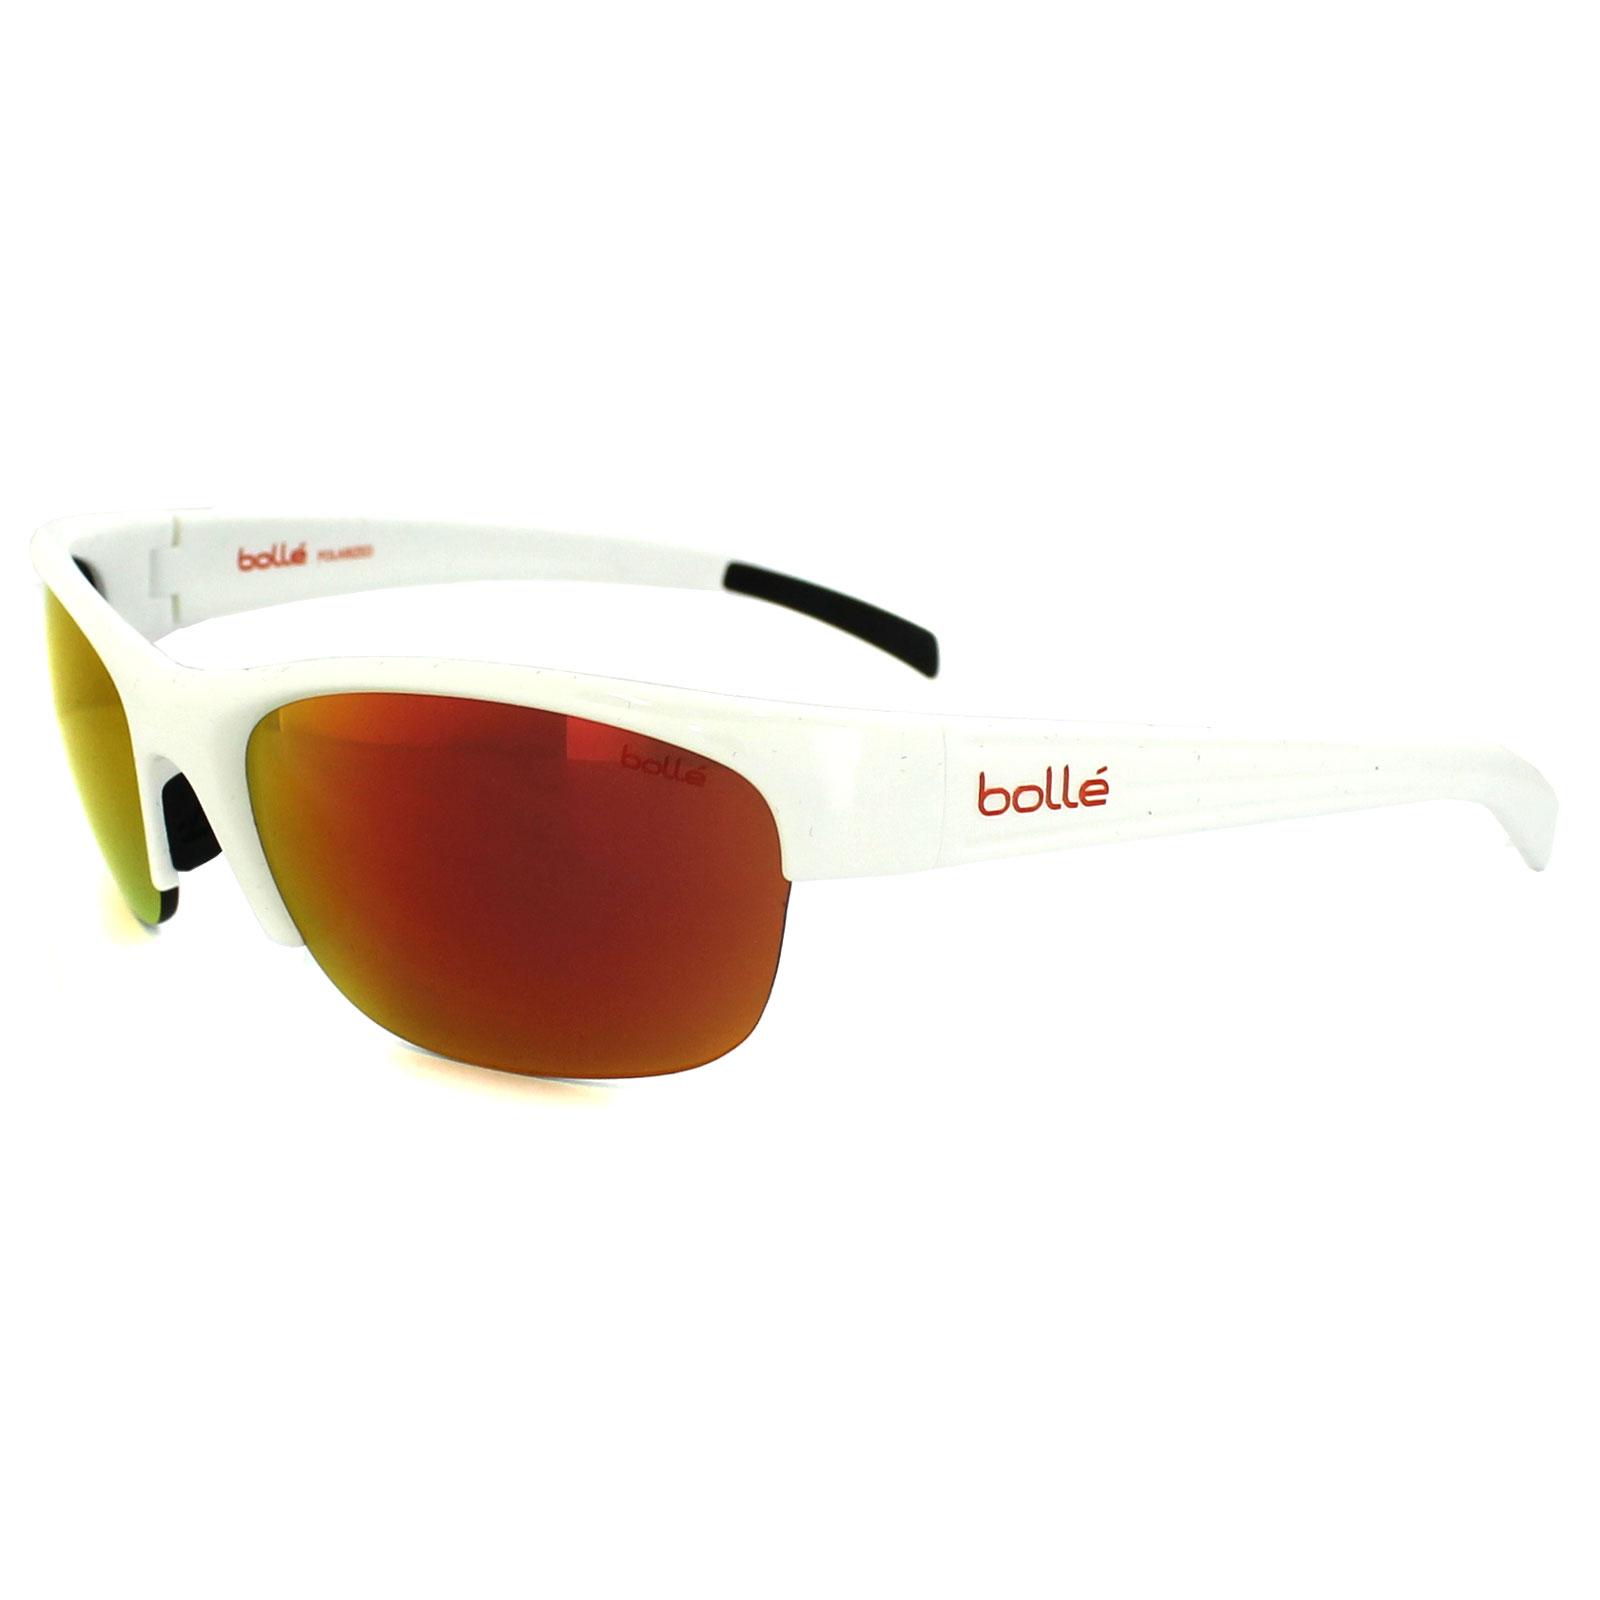 fb884afa53c3 Bolle Fang Polarized Sunglasses Review. Jun20. Elderly friends. Bolle Fang Polarized  Sunglasses Review